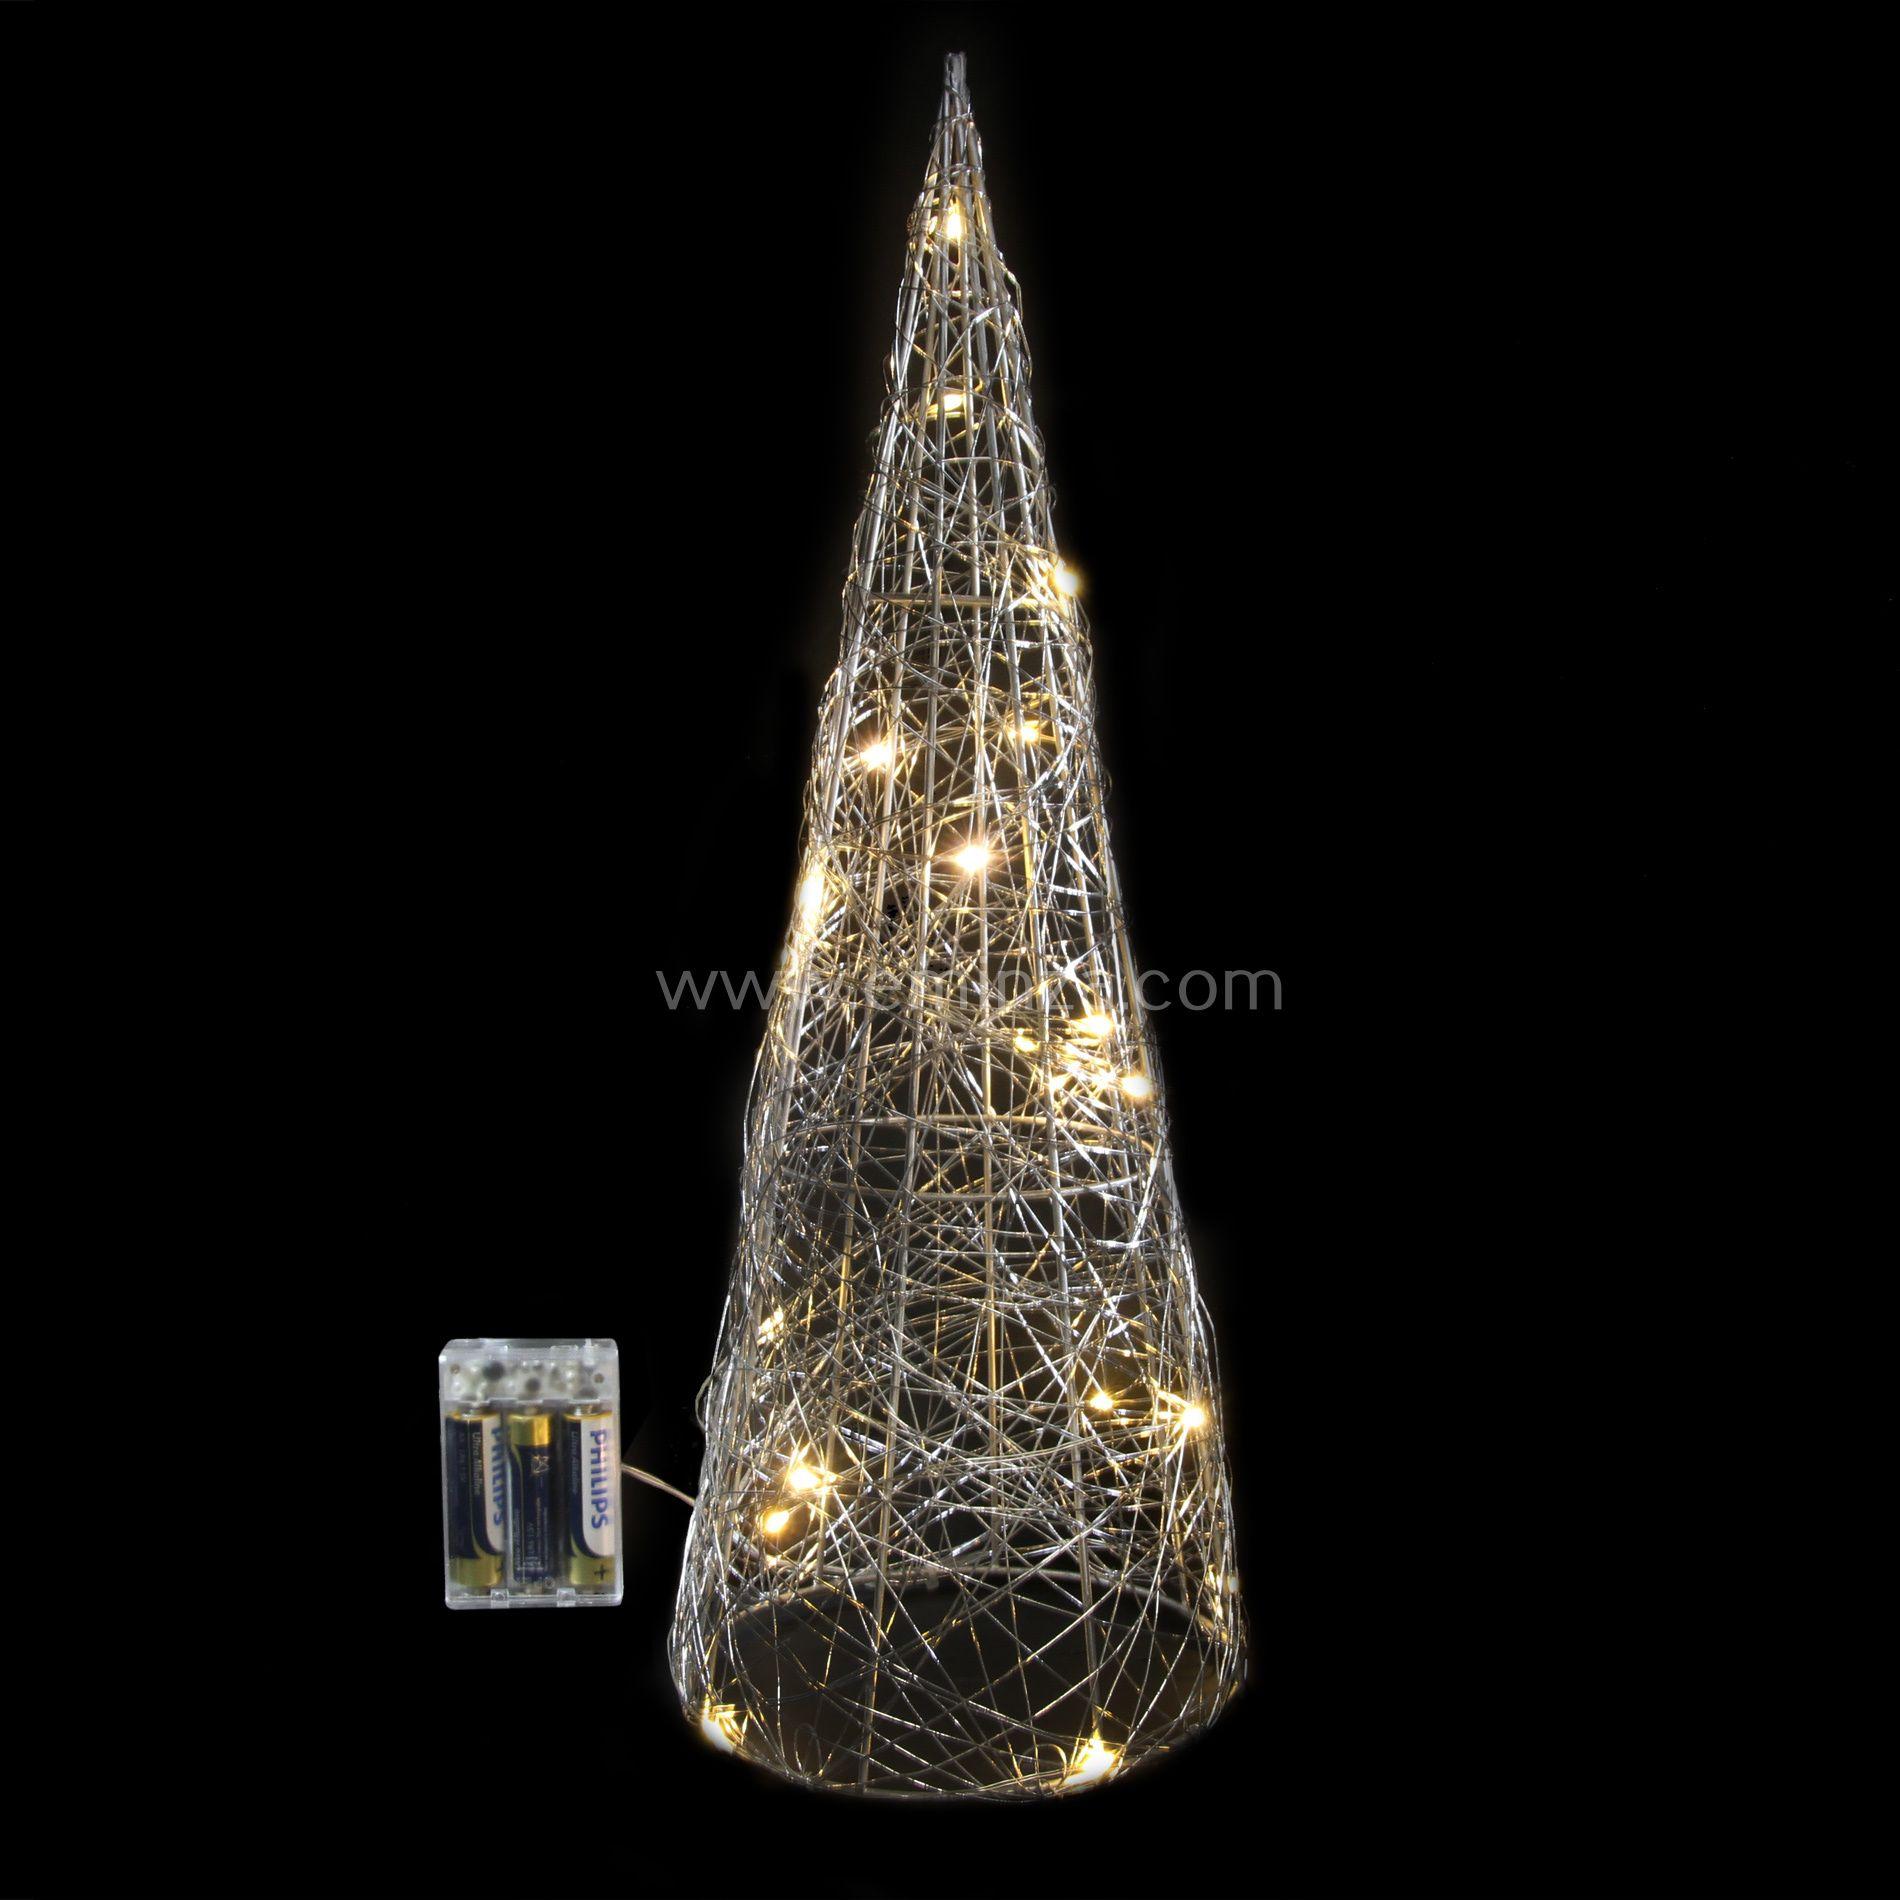 c ne lumineux contemporain blanc chaud 30 micro led silhouette lumineuse eminza. Black Bedroom Furniture Sets. Home Design Ideas